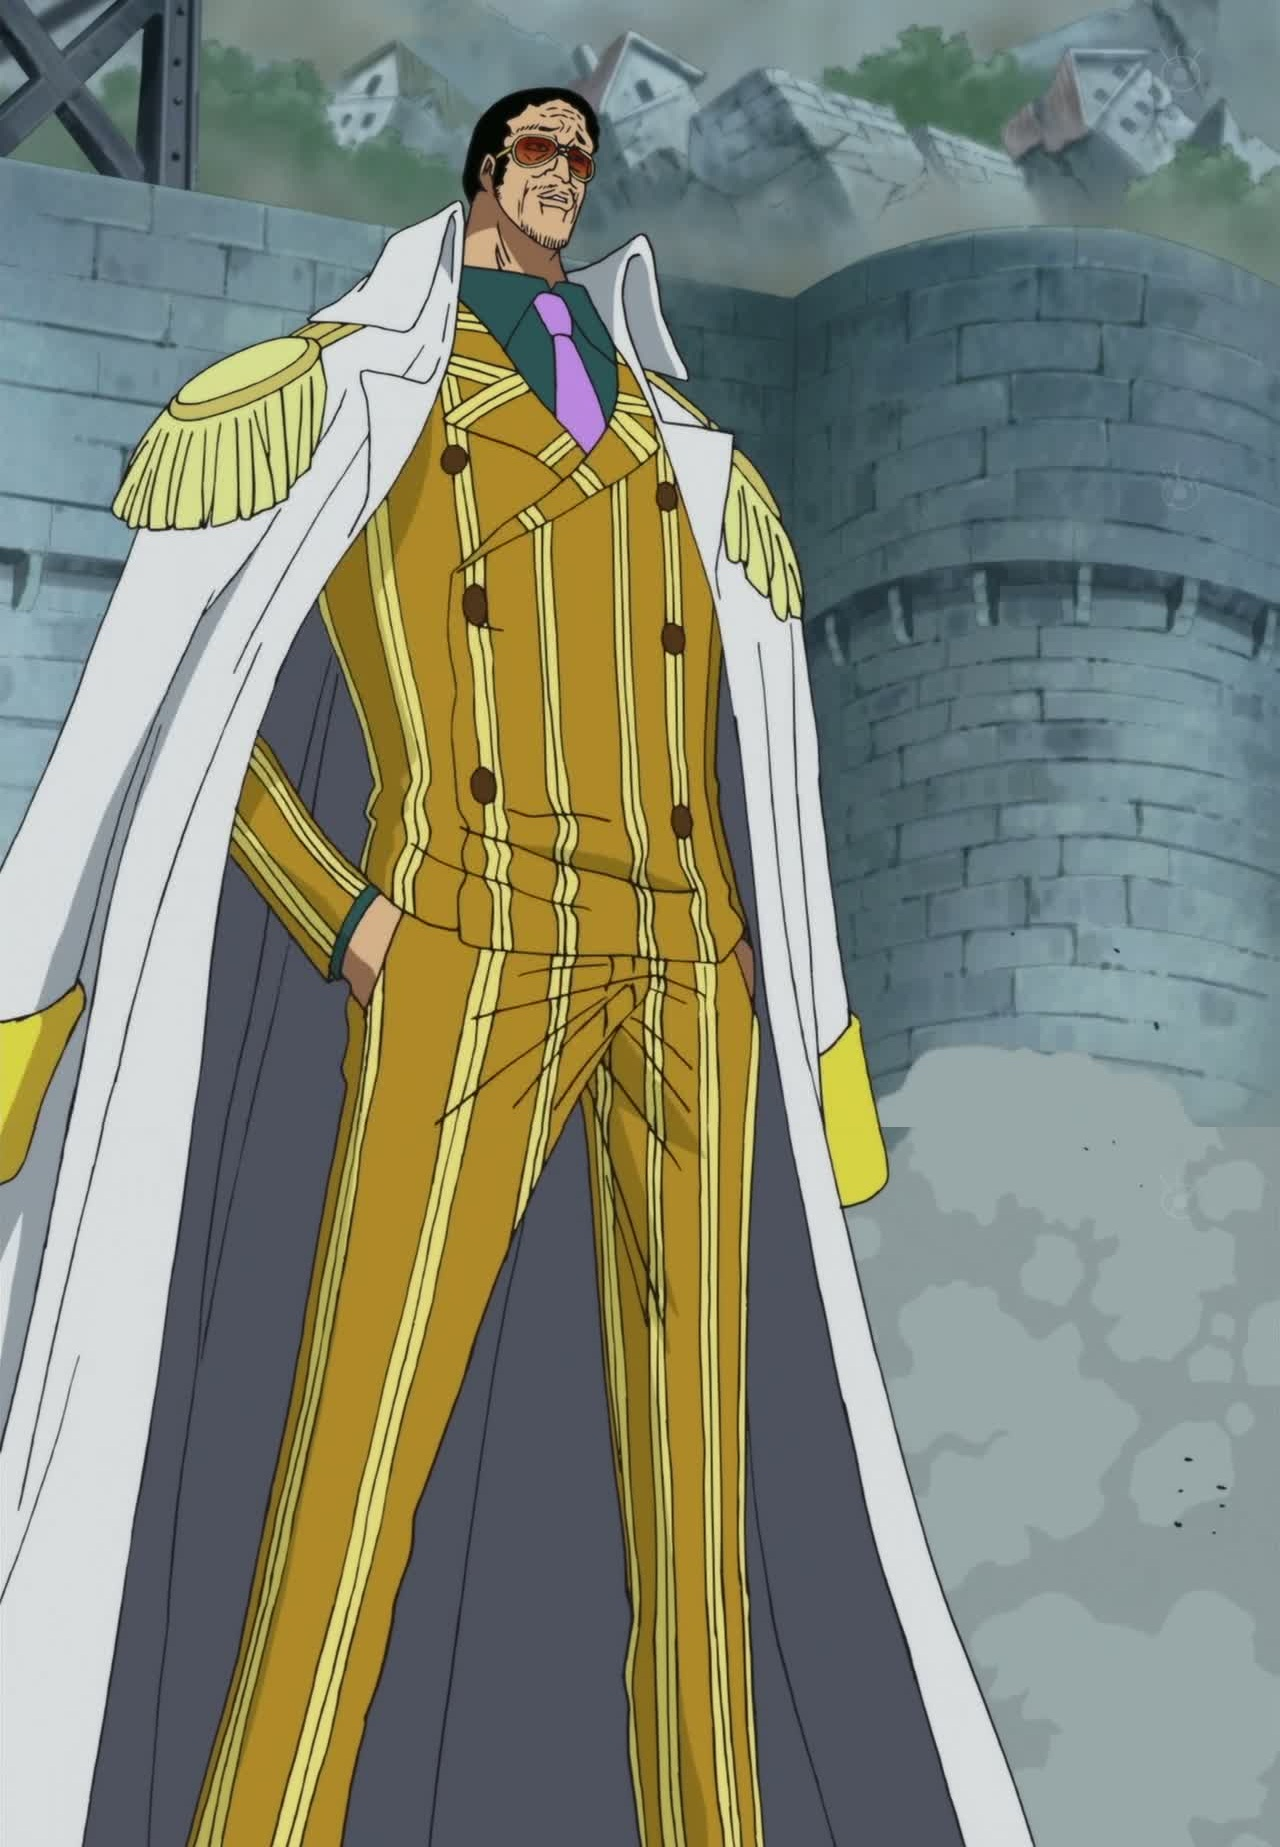 Borsalino | One Piece Treasure Cruise Wiki | FANDOM ...